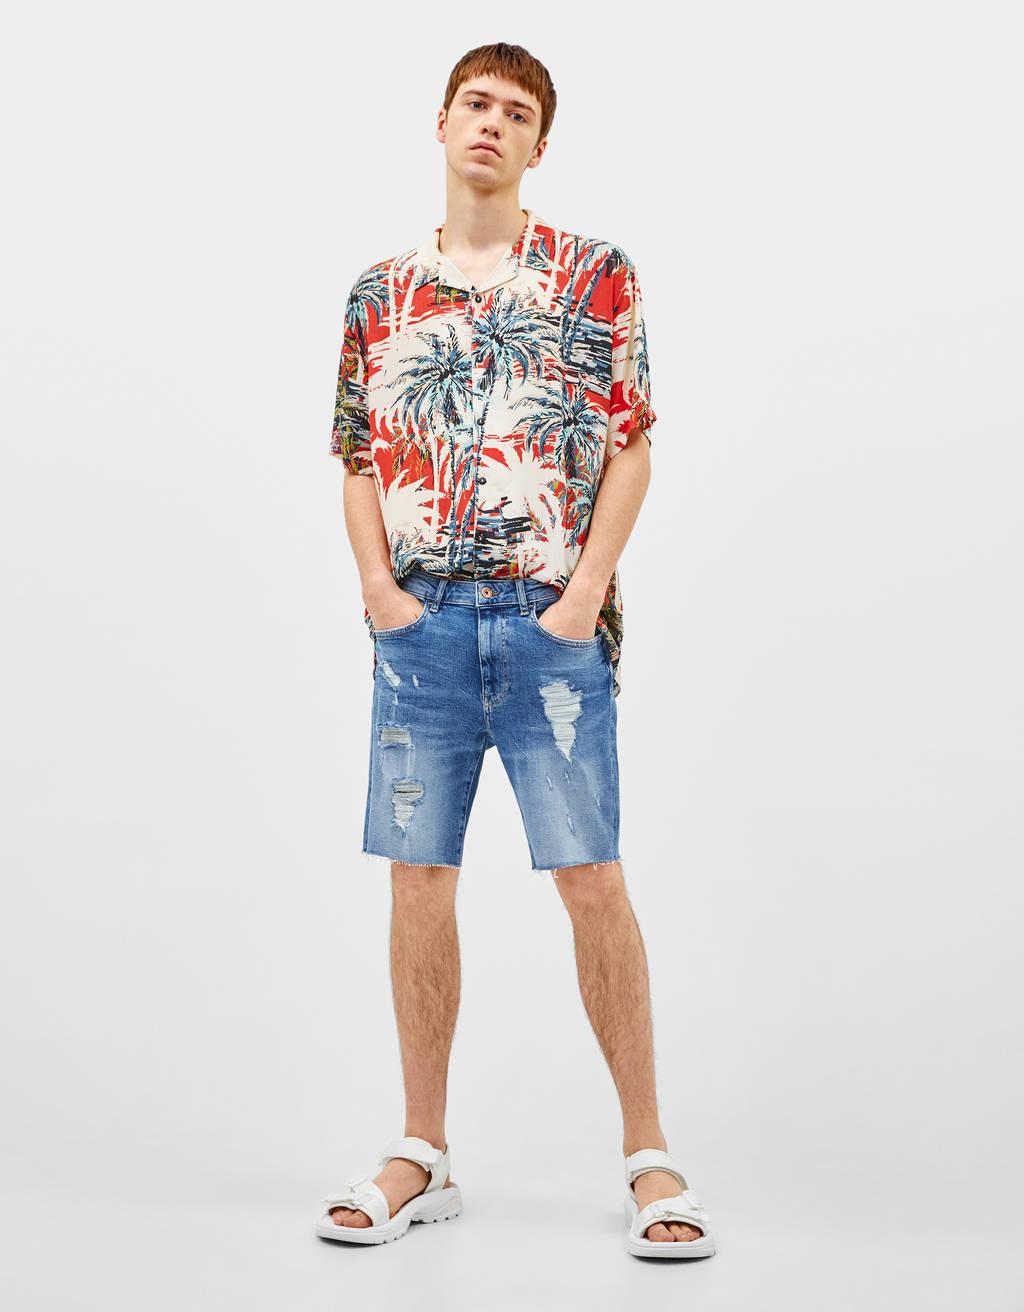 Skinny denim Bermuda shorts with rips